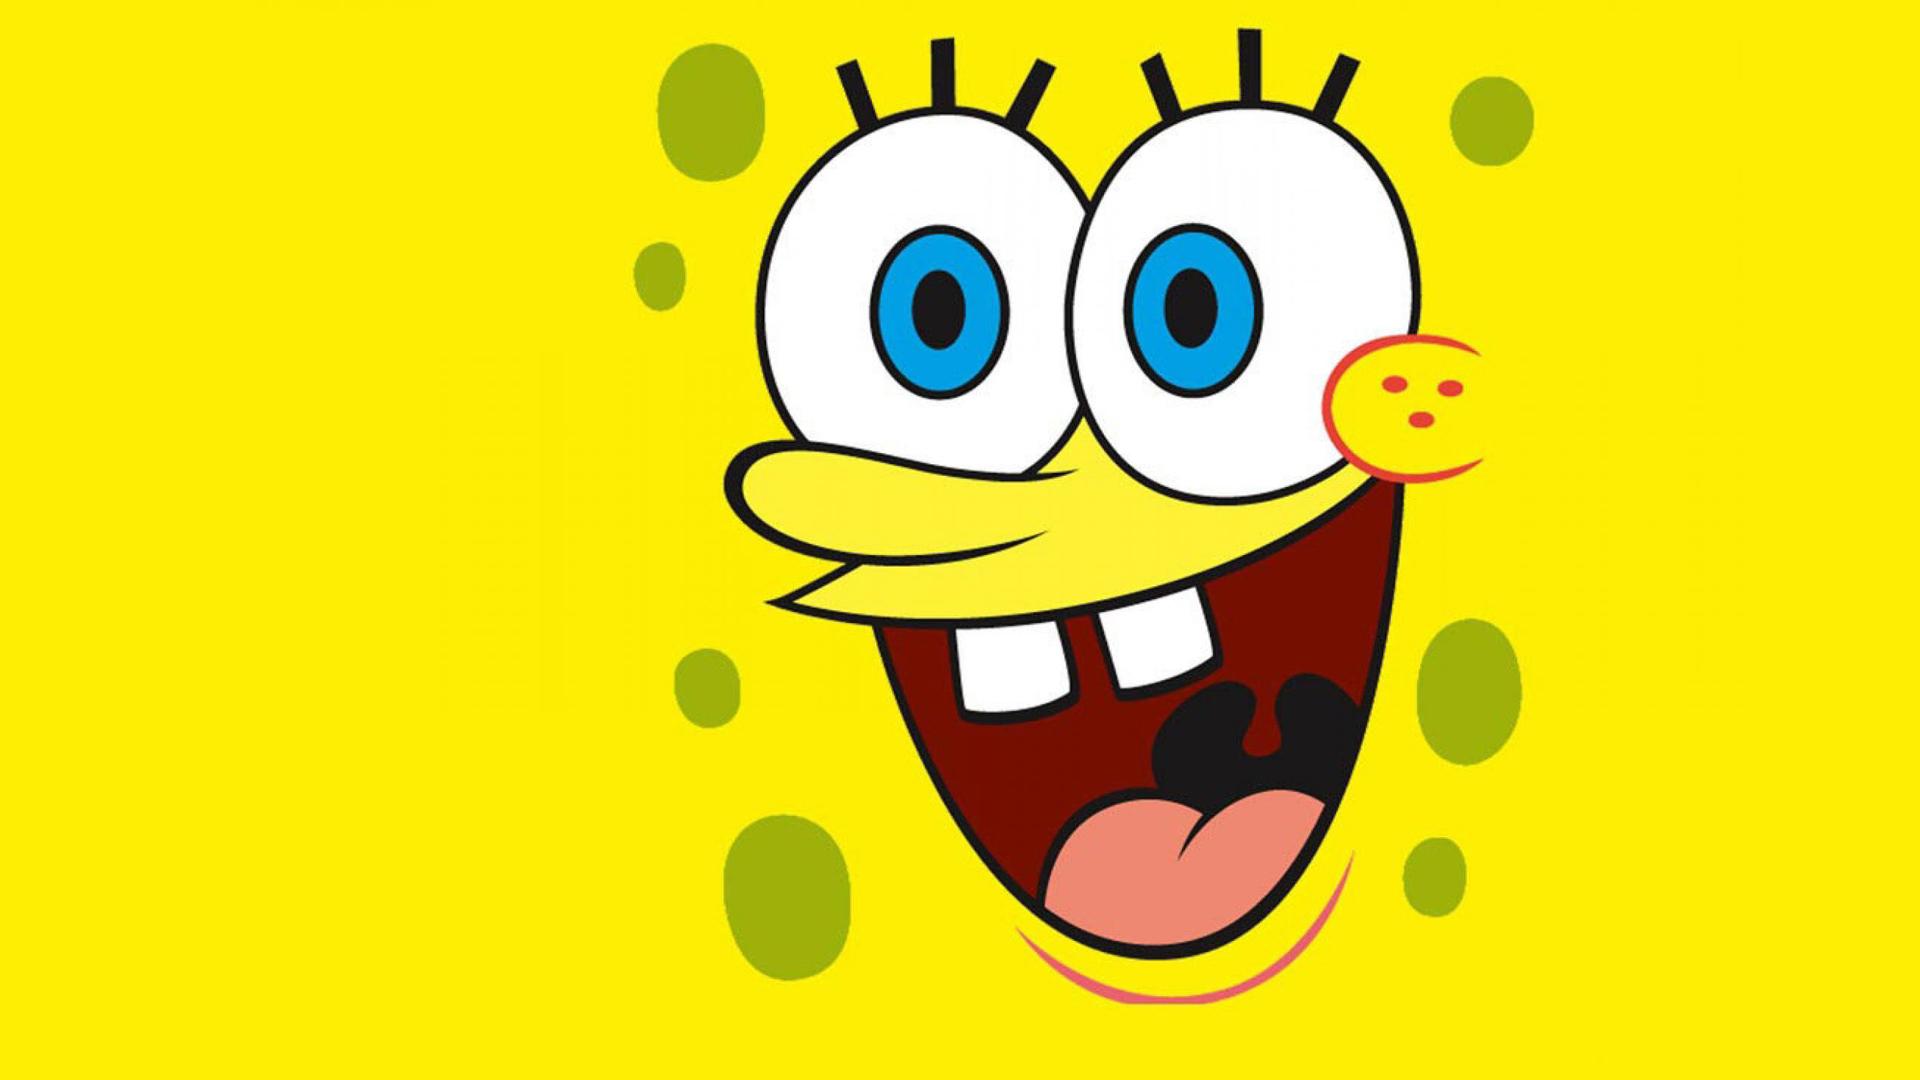 1080 X 1080 Pixels Spongebob Pictures To Pin On Pinterest